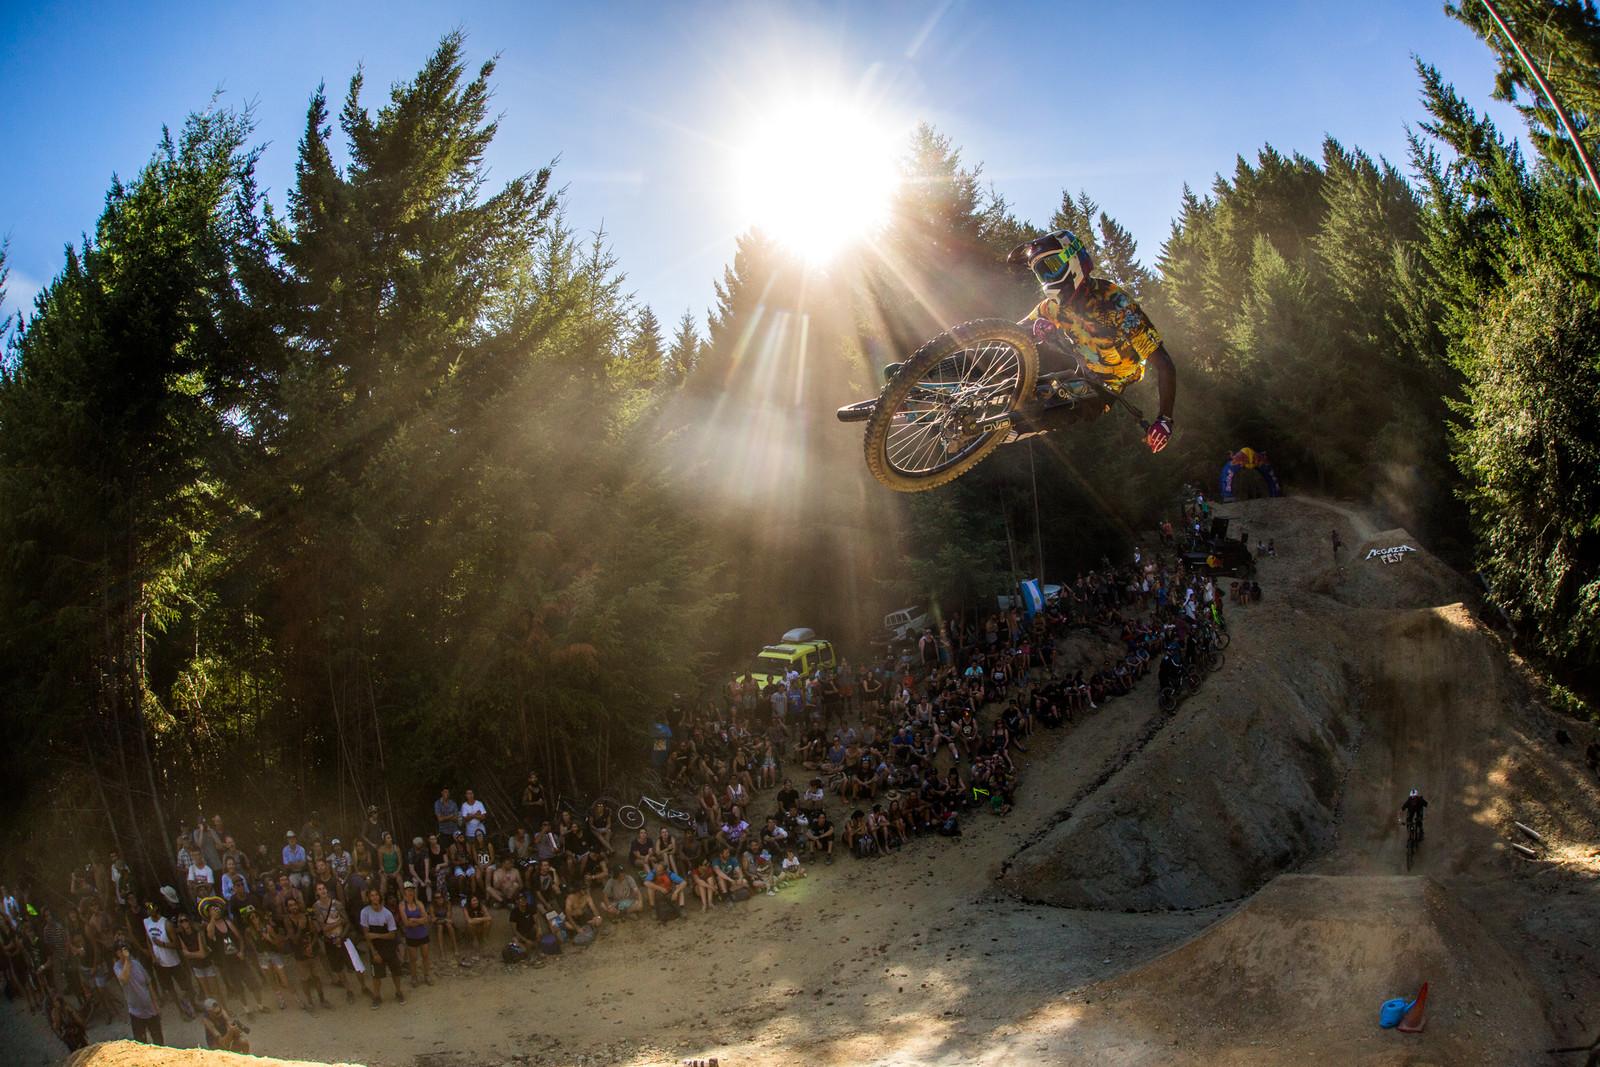 Eliot Jackson - McGazza Fest Dream Track Jam - Mountain Biking Pictures - Vital MTB